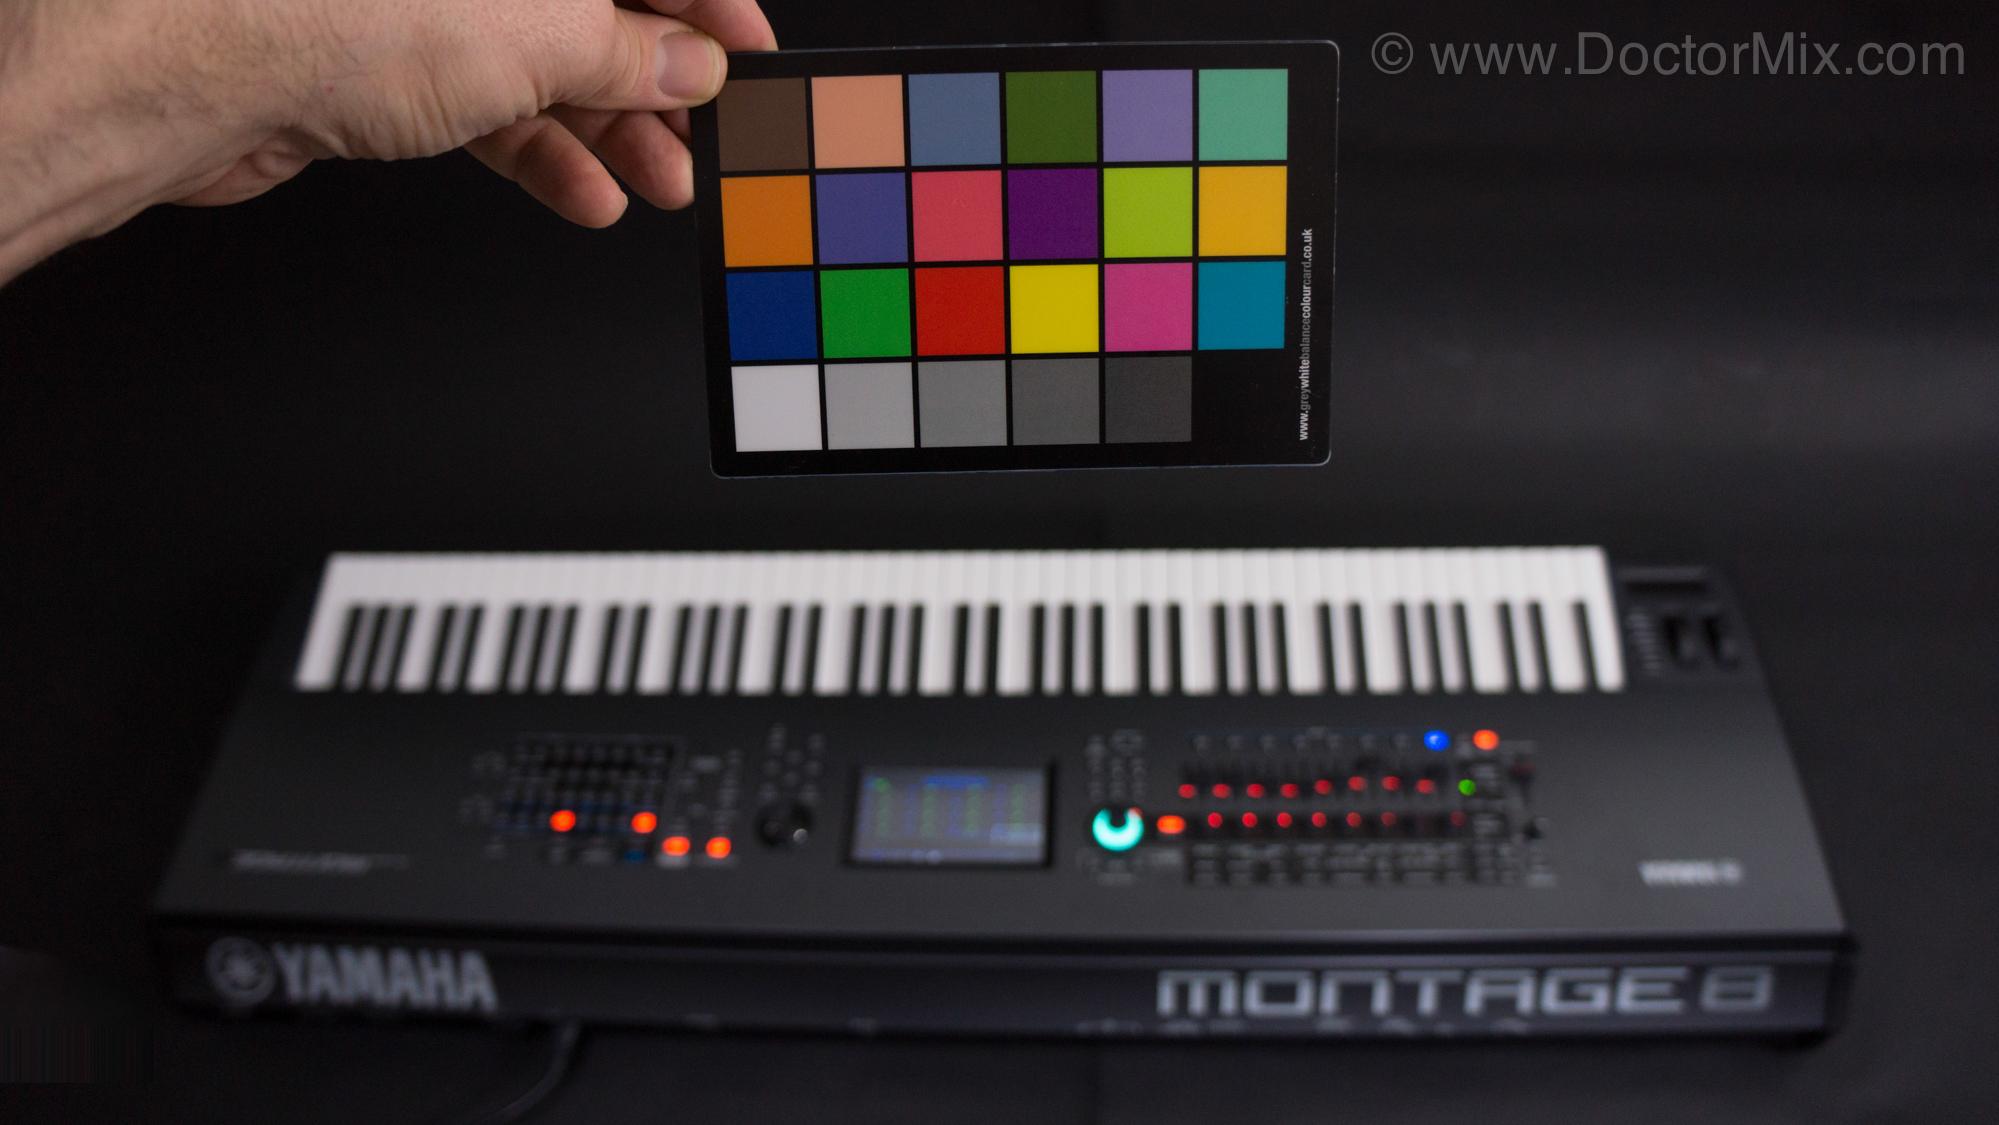 Yamaha Montage Review | Doctormix